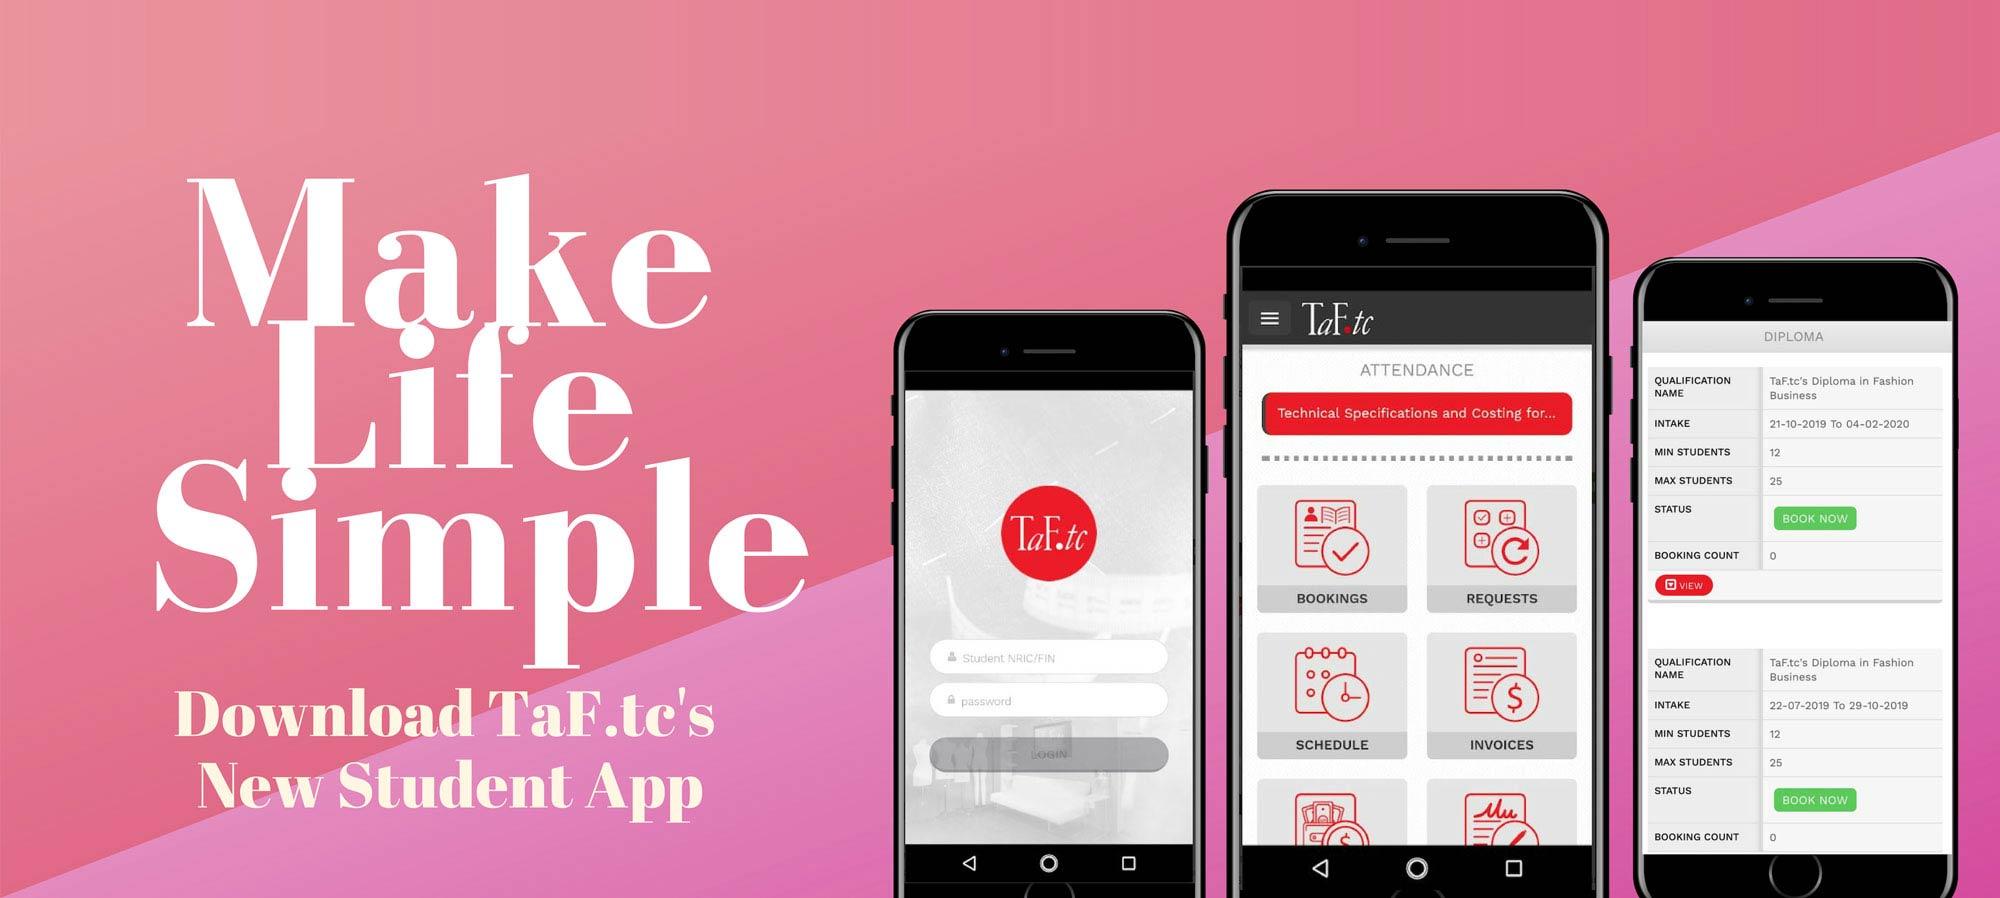 TaF.tc's Student App